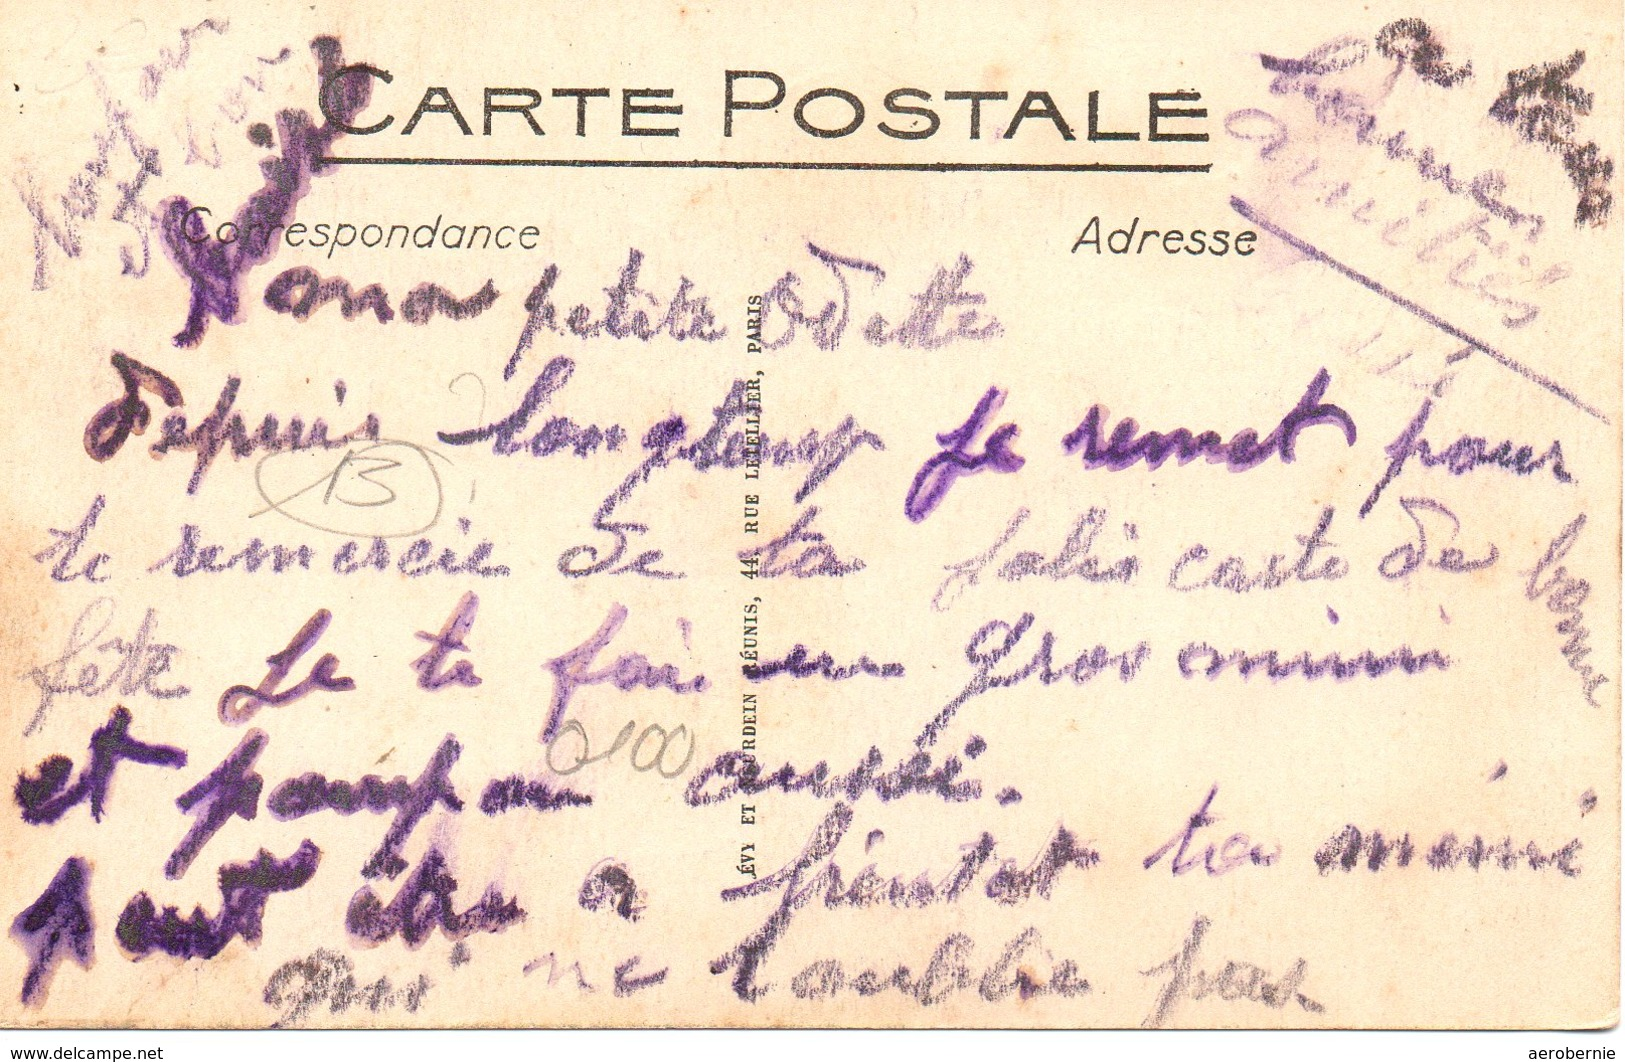 Alte Postkarte VIADUC DE CARONTE - Eisenbahndrehbrücke Frankreich - Kunstbauten